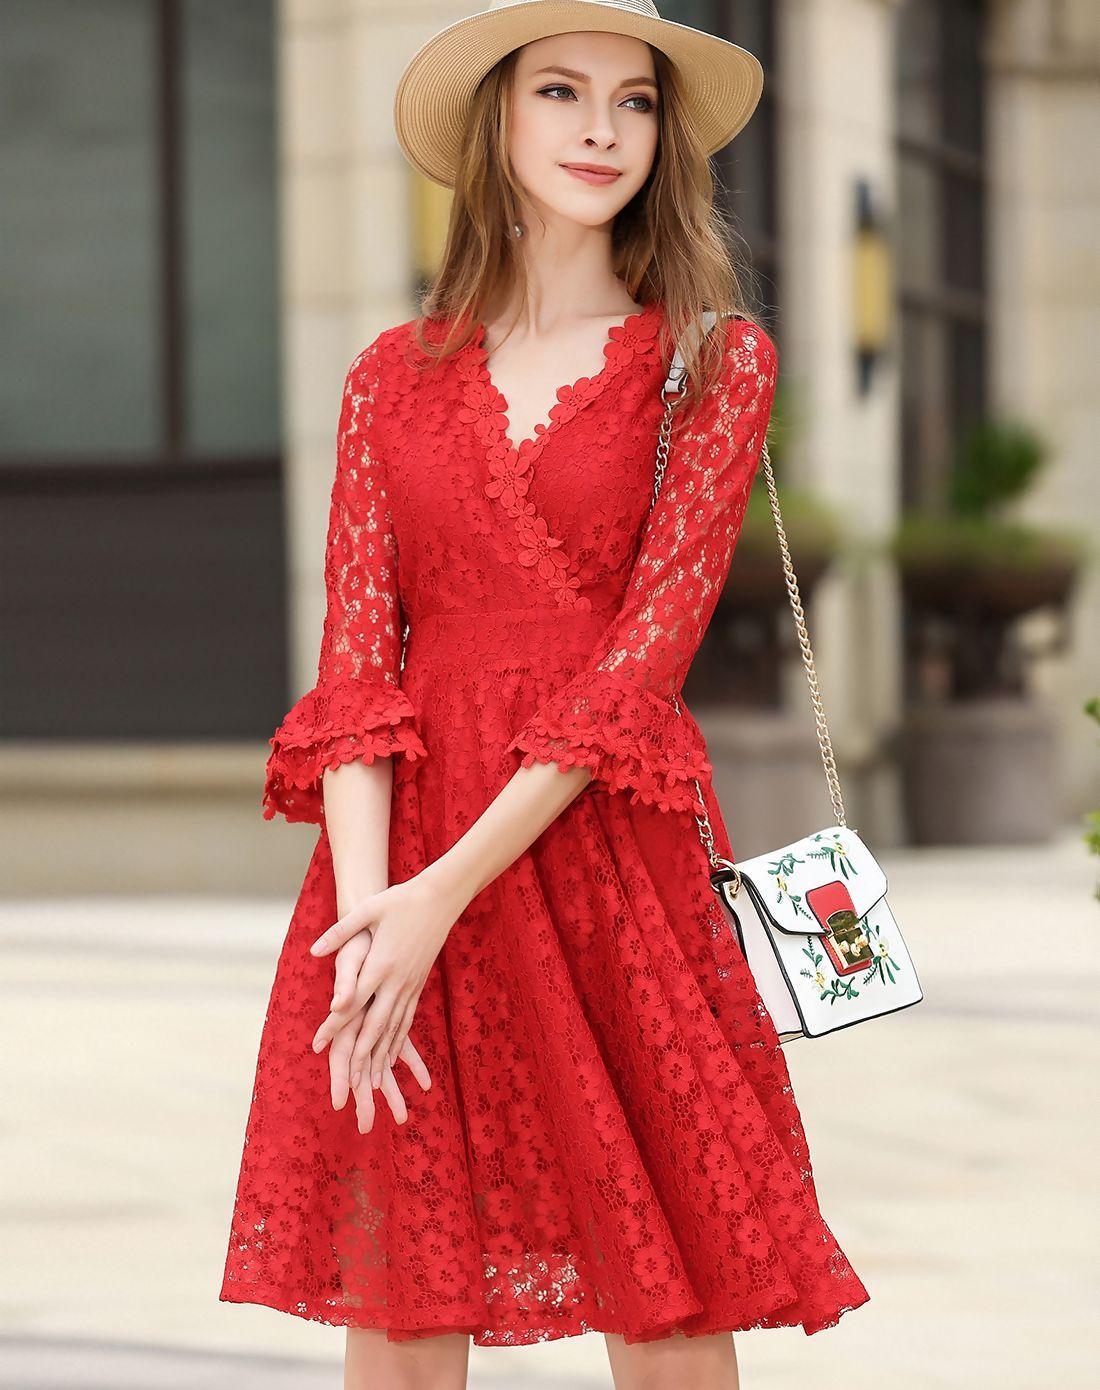 Adorewe vipme aline dressesdesigner fwaysby red lace v neck